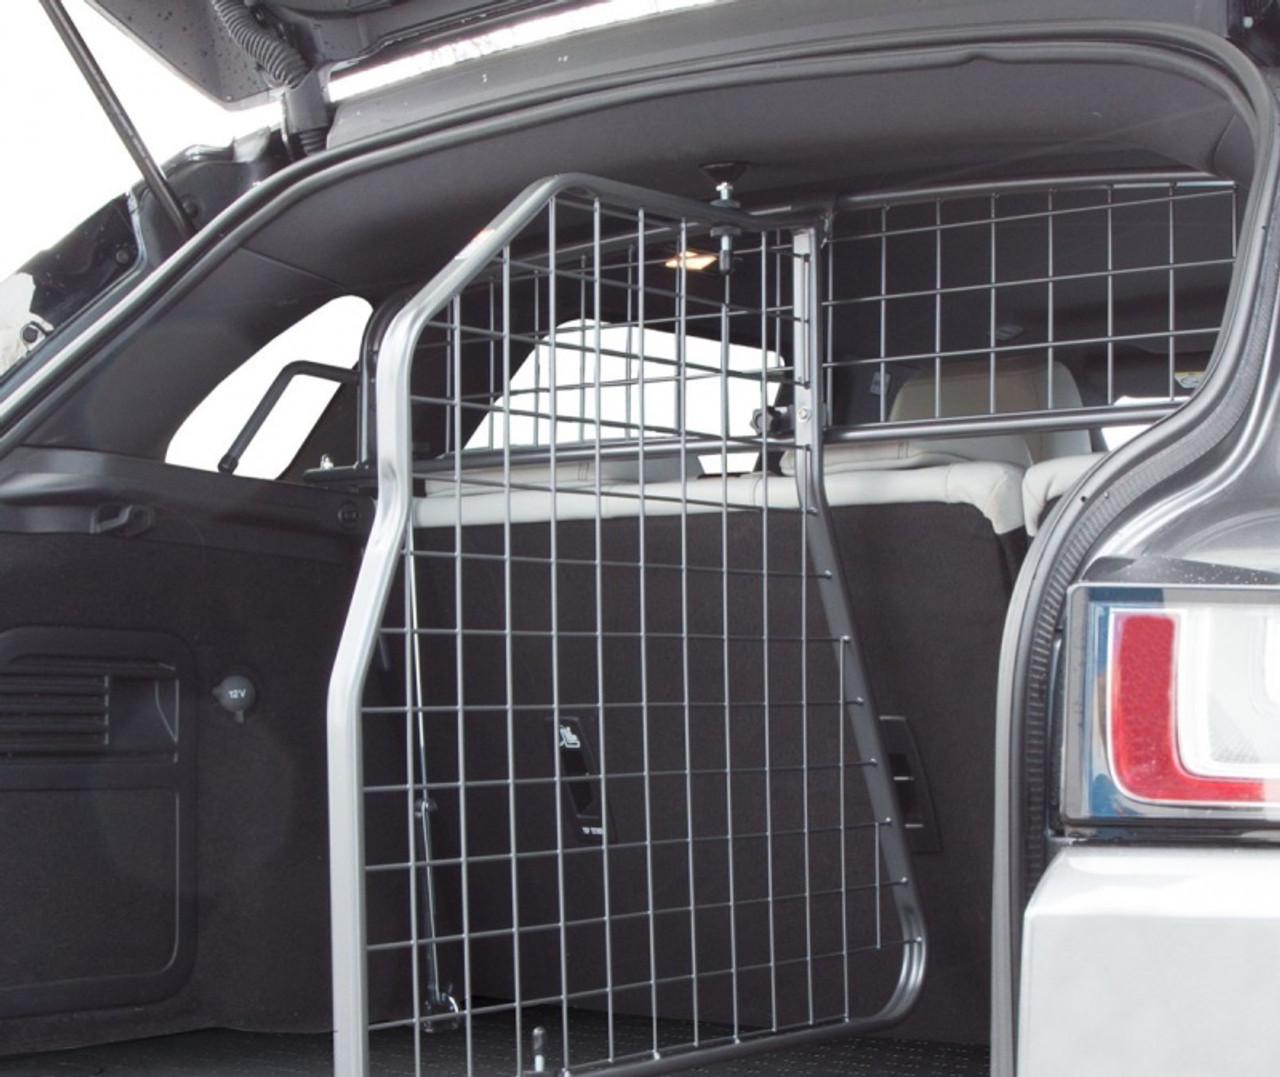 Travall Range Rover Evoque 5 Door Dog Guard Divider Only - TDG1516D